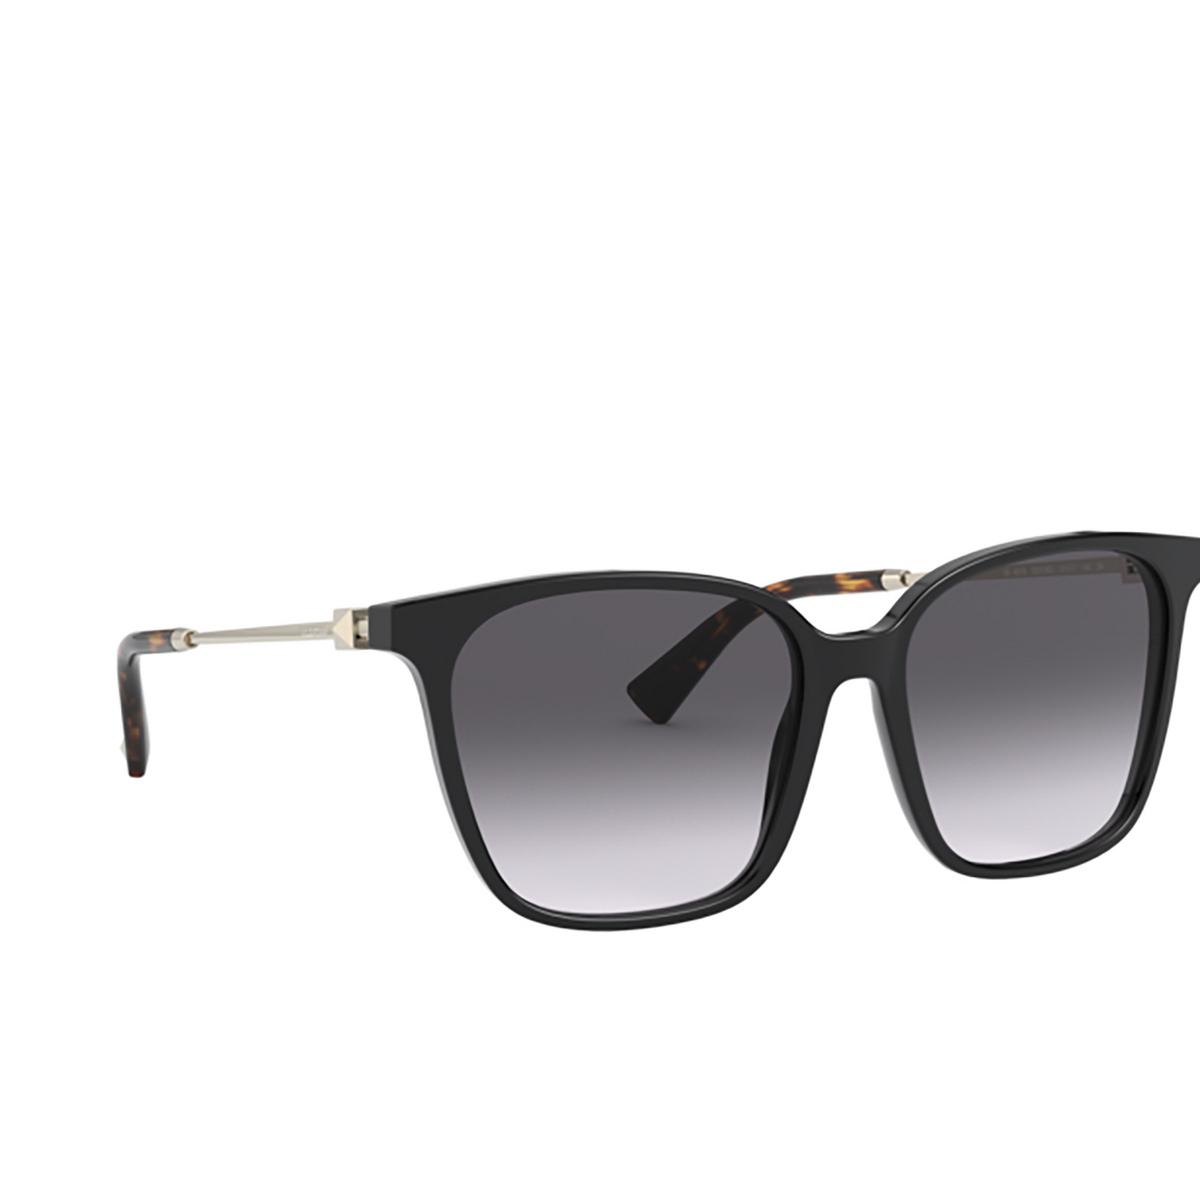 Valentino® Square Sunglasses: VA4078 color Black 50018G - three-quarters view.